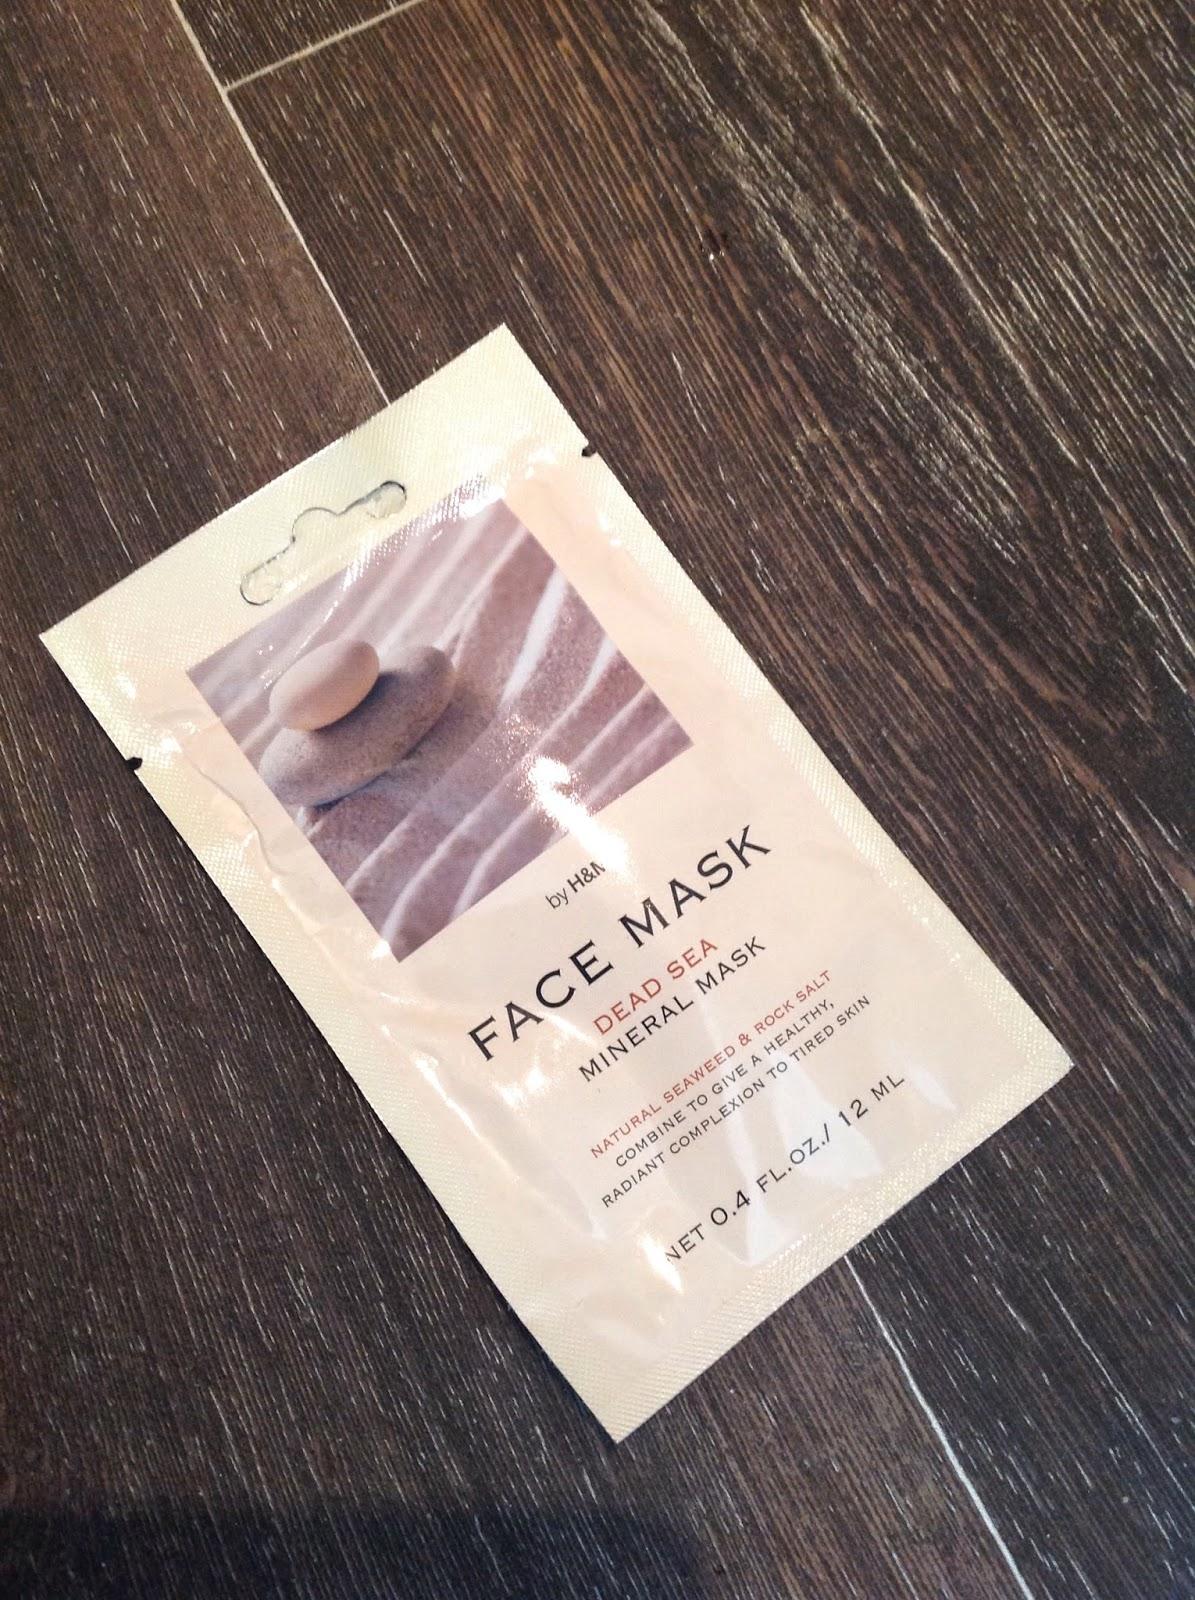 H&M Dead Sea Mineral Mask